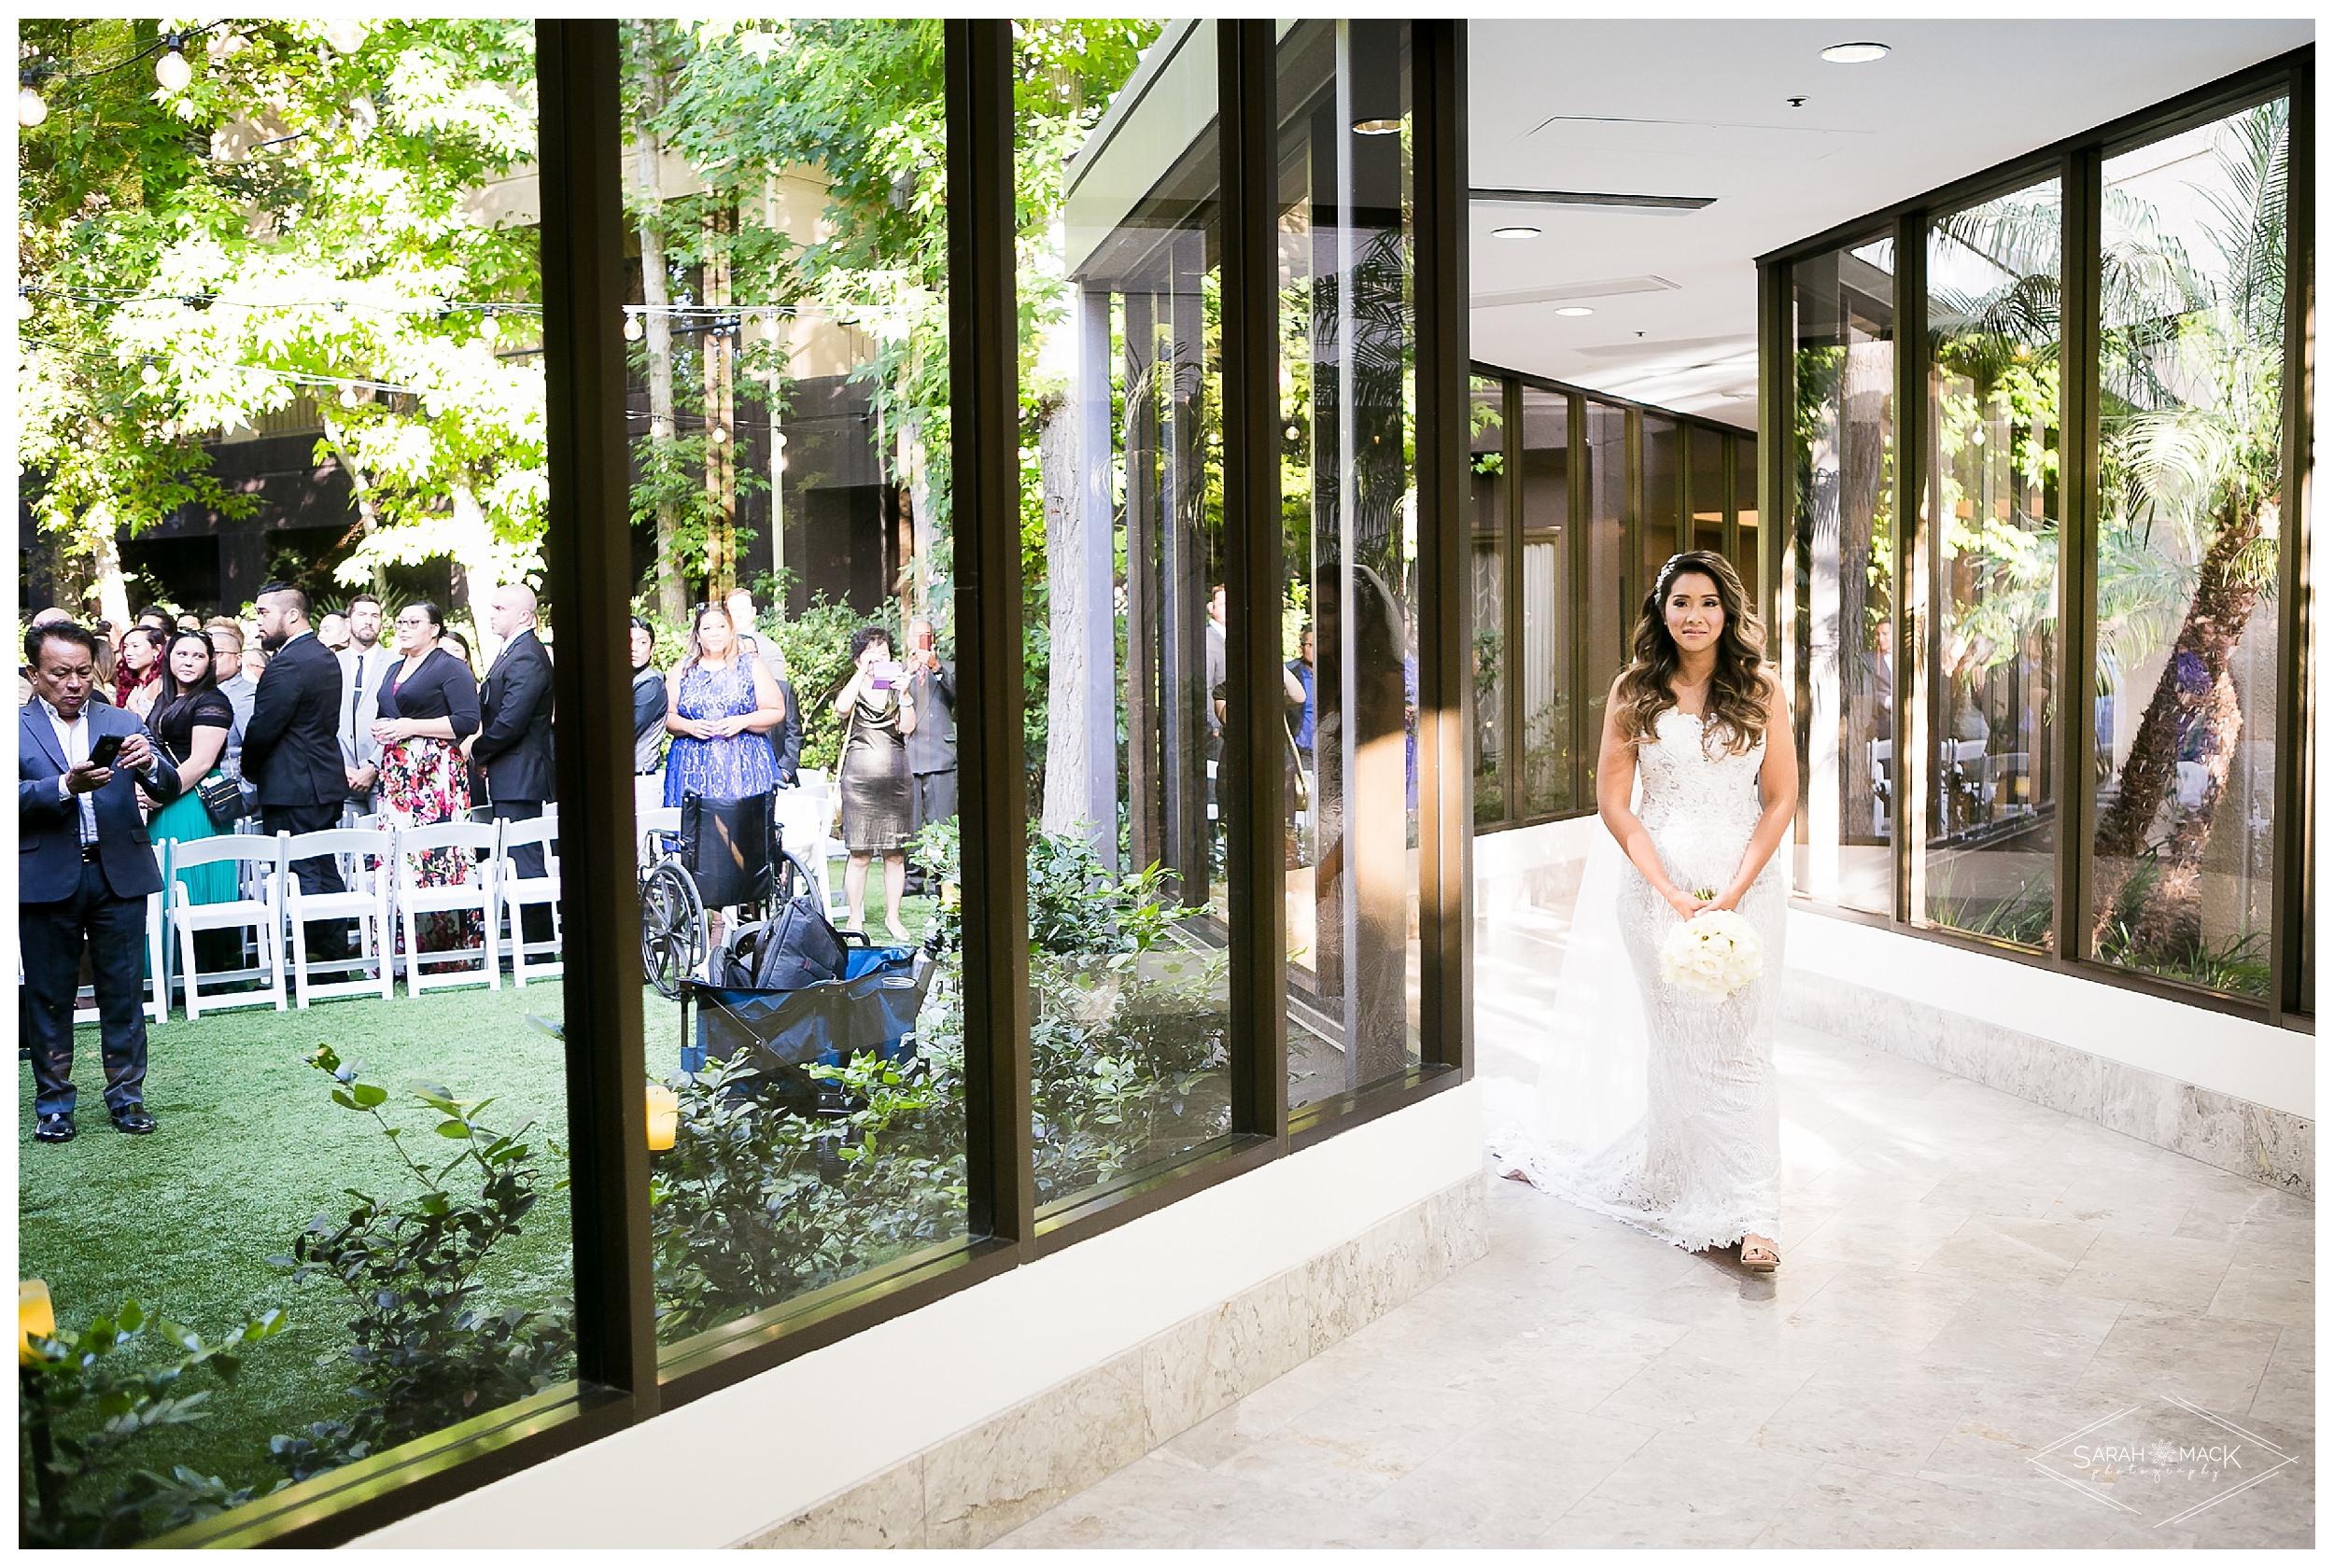 LE-Avenue-of-the-Arts-Costa-Mesa-Wedding-Photography-0141.jpg